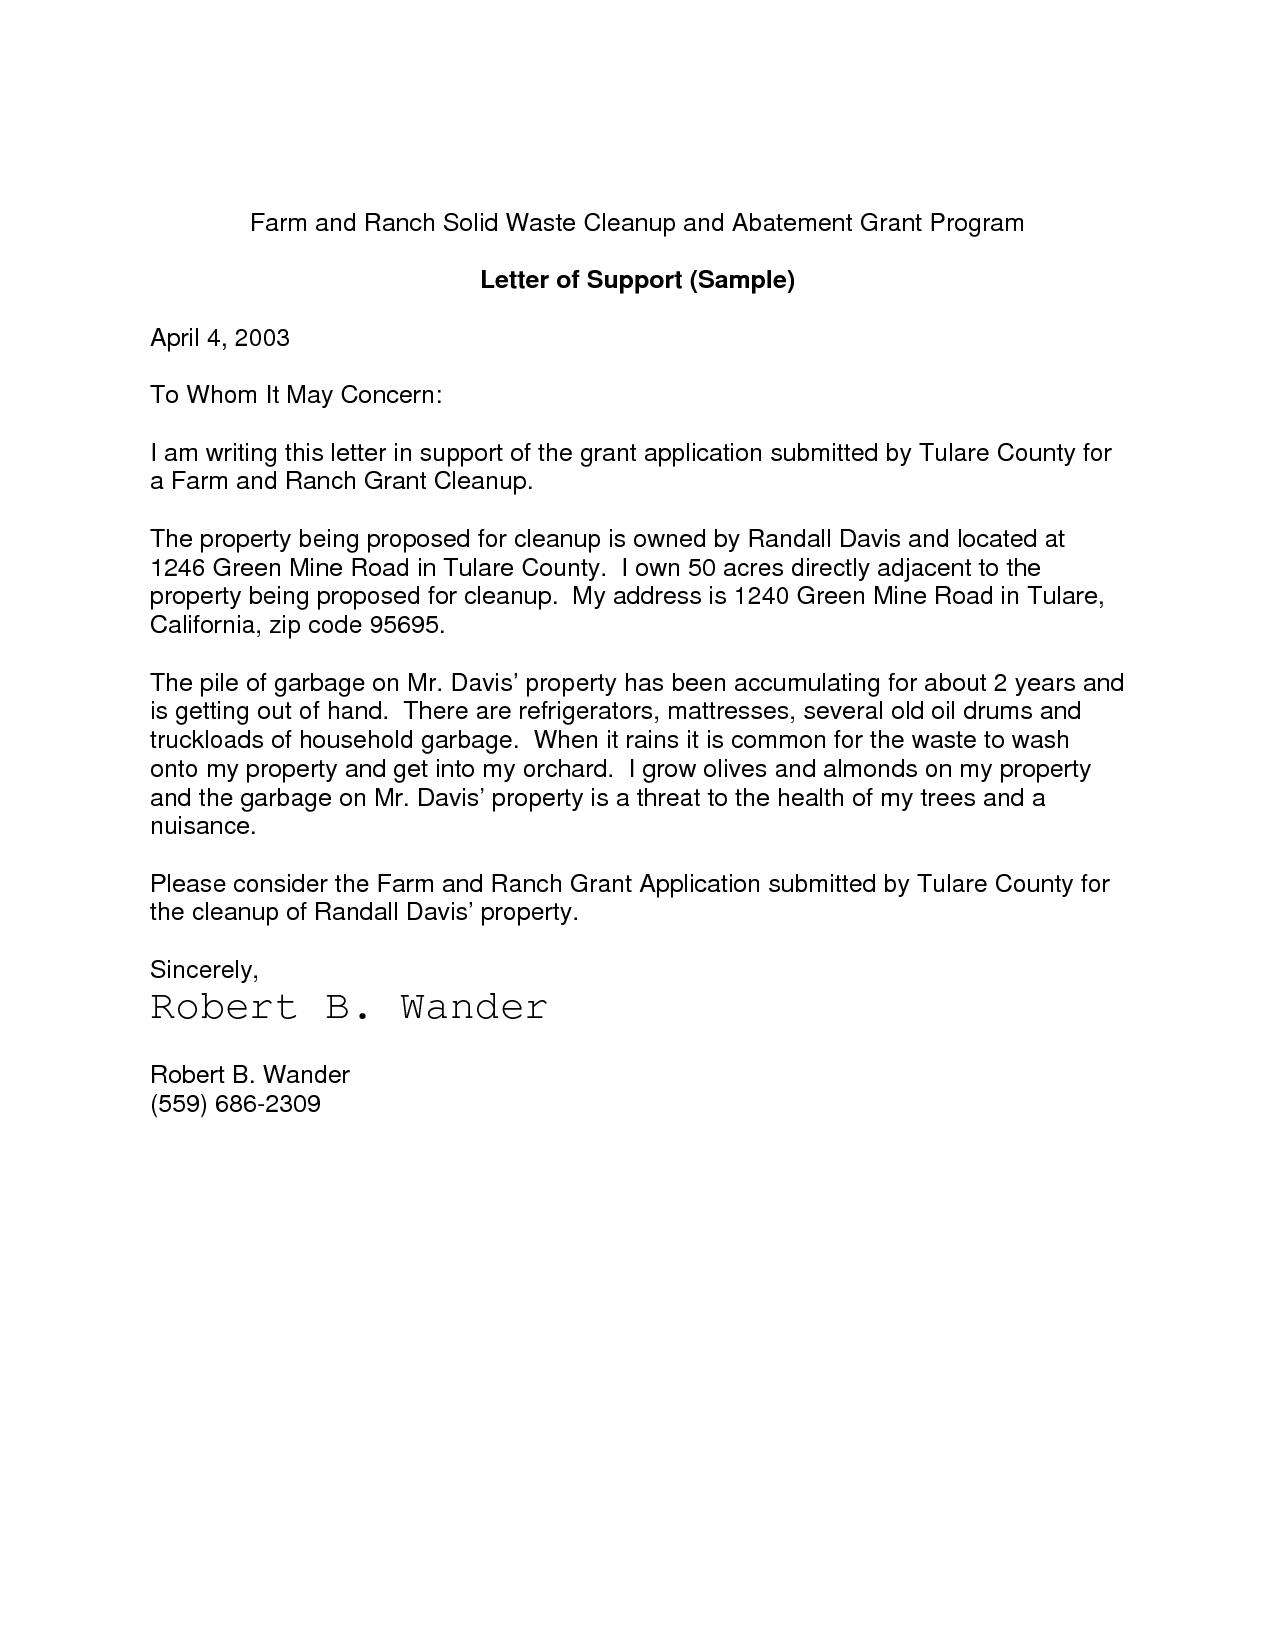 How To Make Cover Letter Resume Cover Letter For Nih Grant Application Grant Cover Letter Resume .